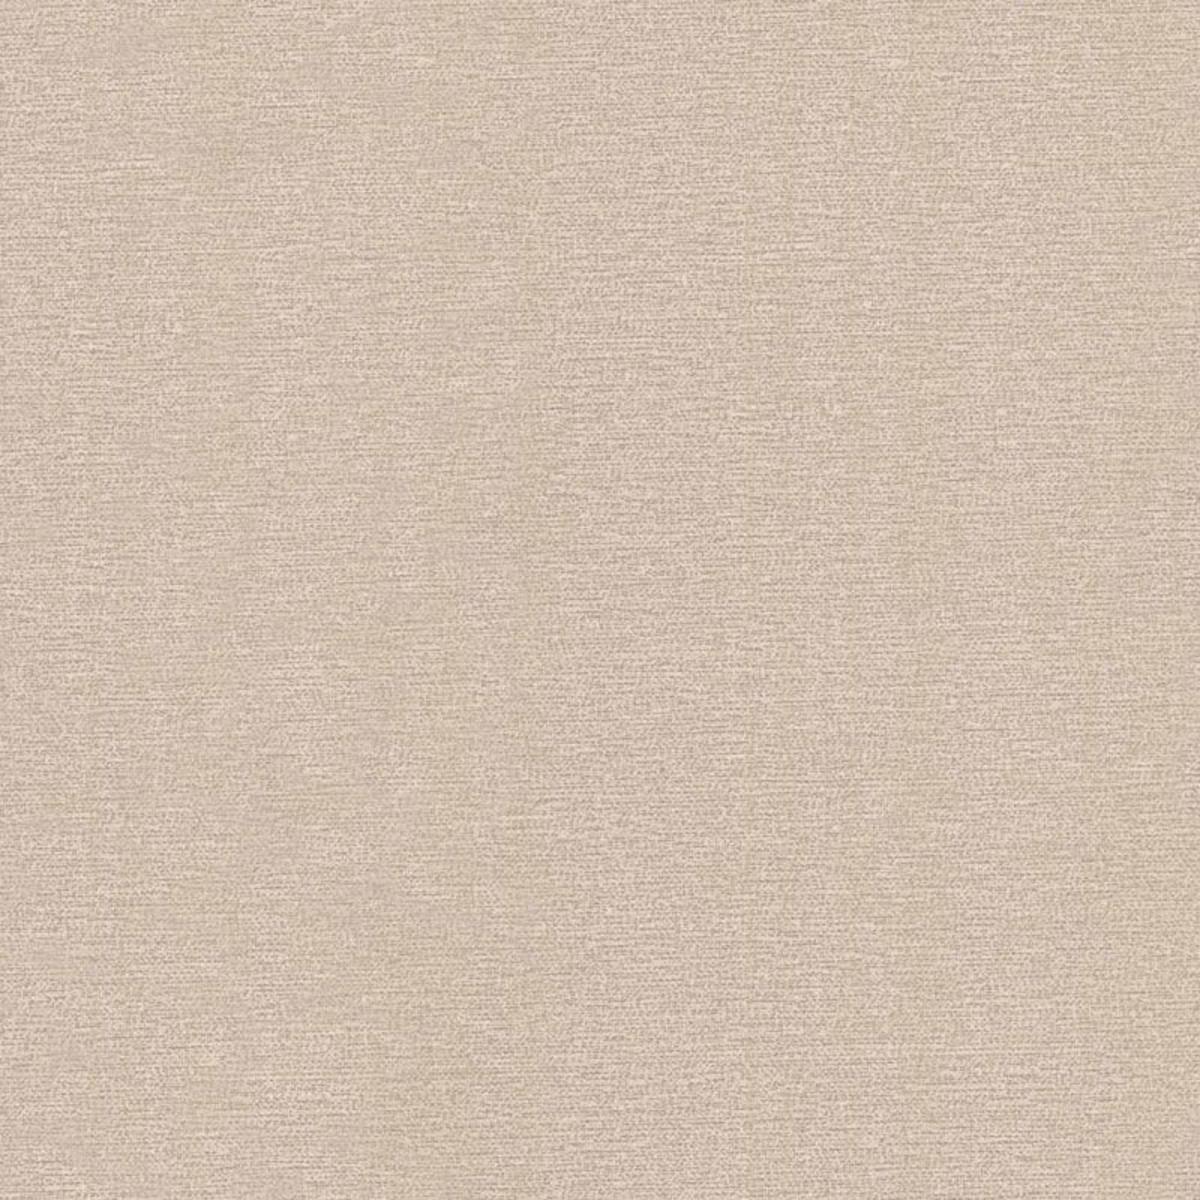 Обои флизелиновые Артекс Freedom бежевые 1.06 м 10057-04